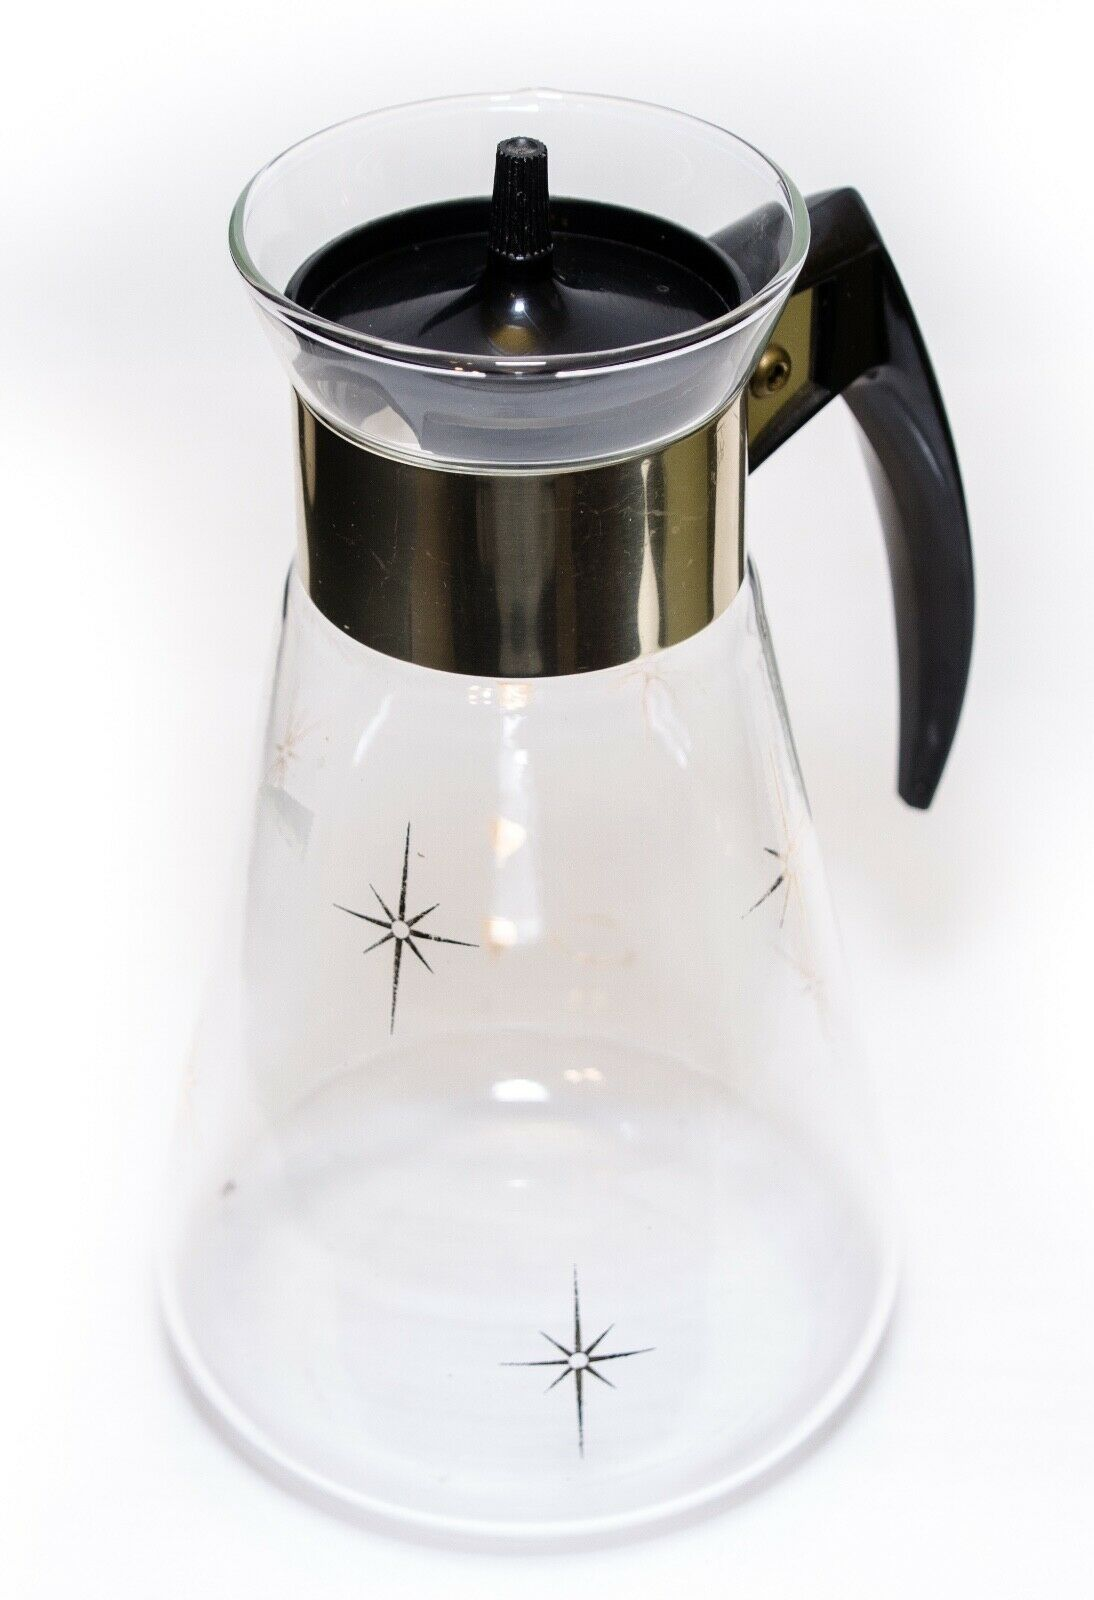 Corning Coffee Pot Carafe Atomic Star Burst 6 Cup Heatproof Glass 1960's Vintage - $15.35